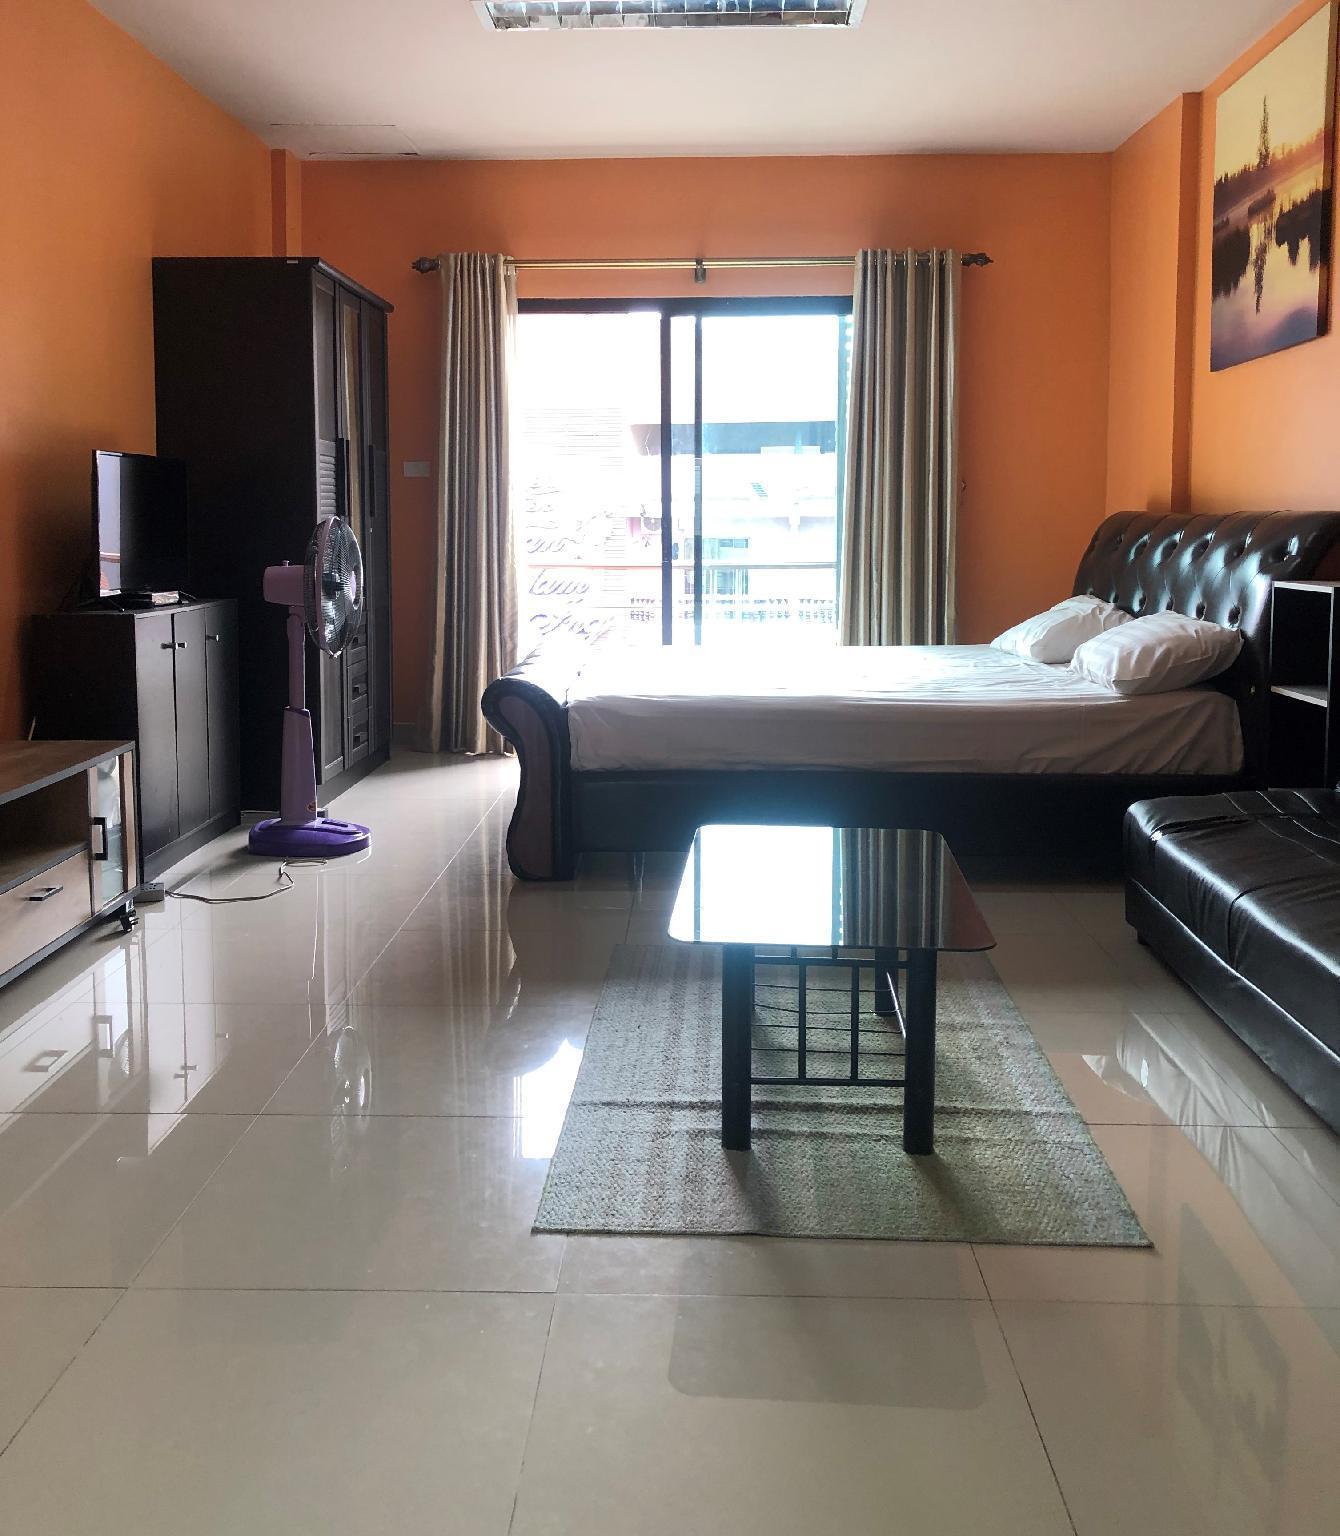 StarMax Guesthouse, Soi Buakhao, Pattaya, Room 3 อพาร์ตเมนต์ 1 ห้องนอน 1 ห้องน้ำส่วนตัว ขนาด 45 ตร.ม. – พัทยากลาง